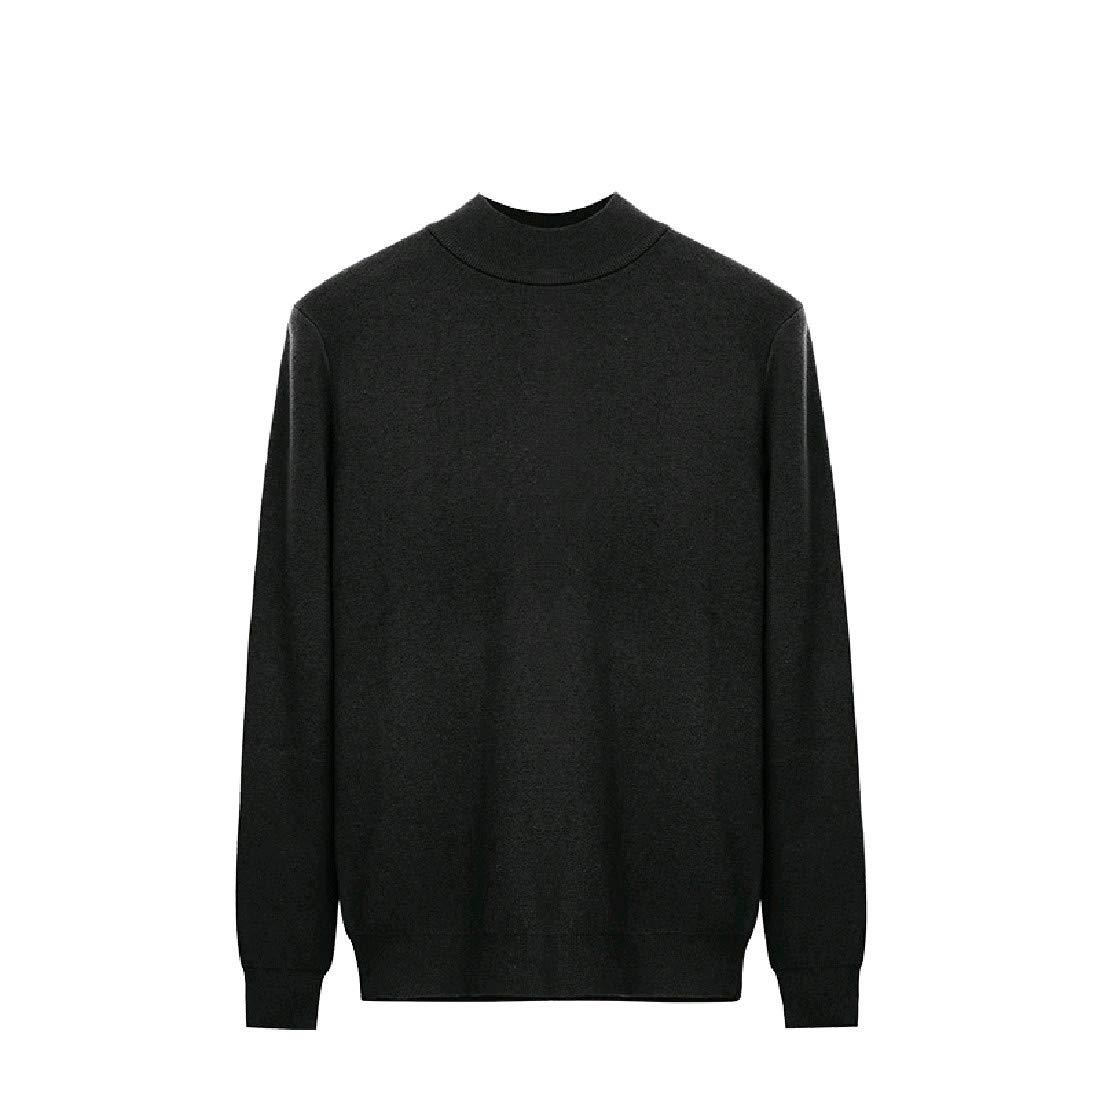 YUNY Men Turtleneck Pullover Oversize Colortone Pullover Sweater Grey 2XL